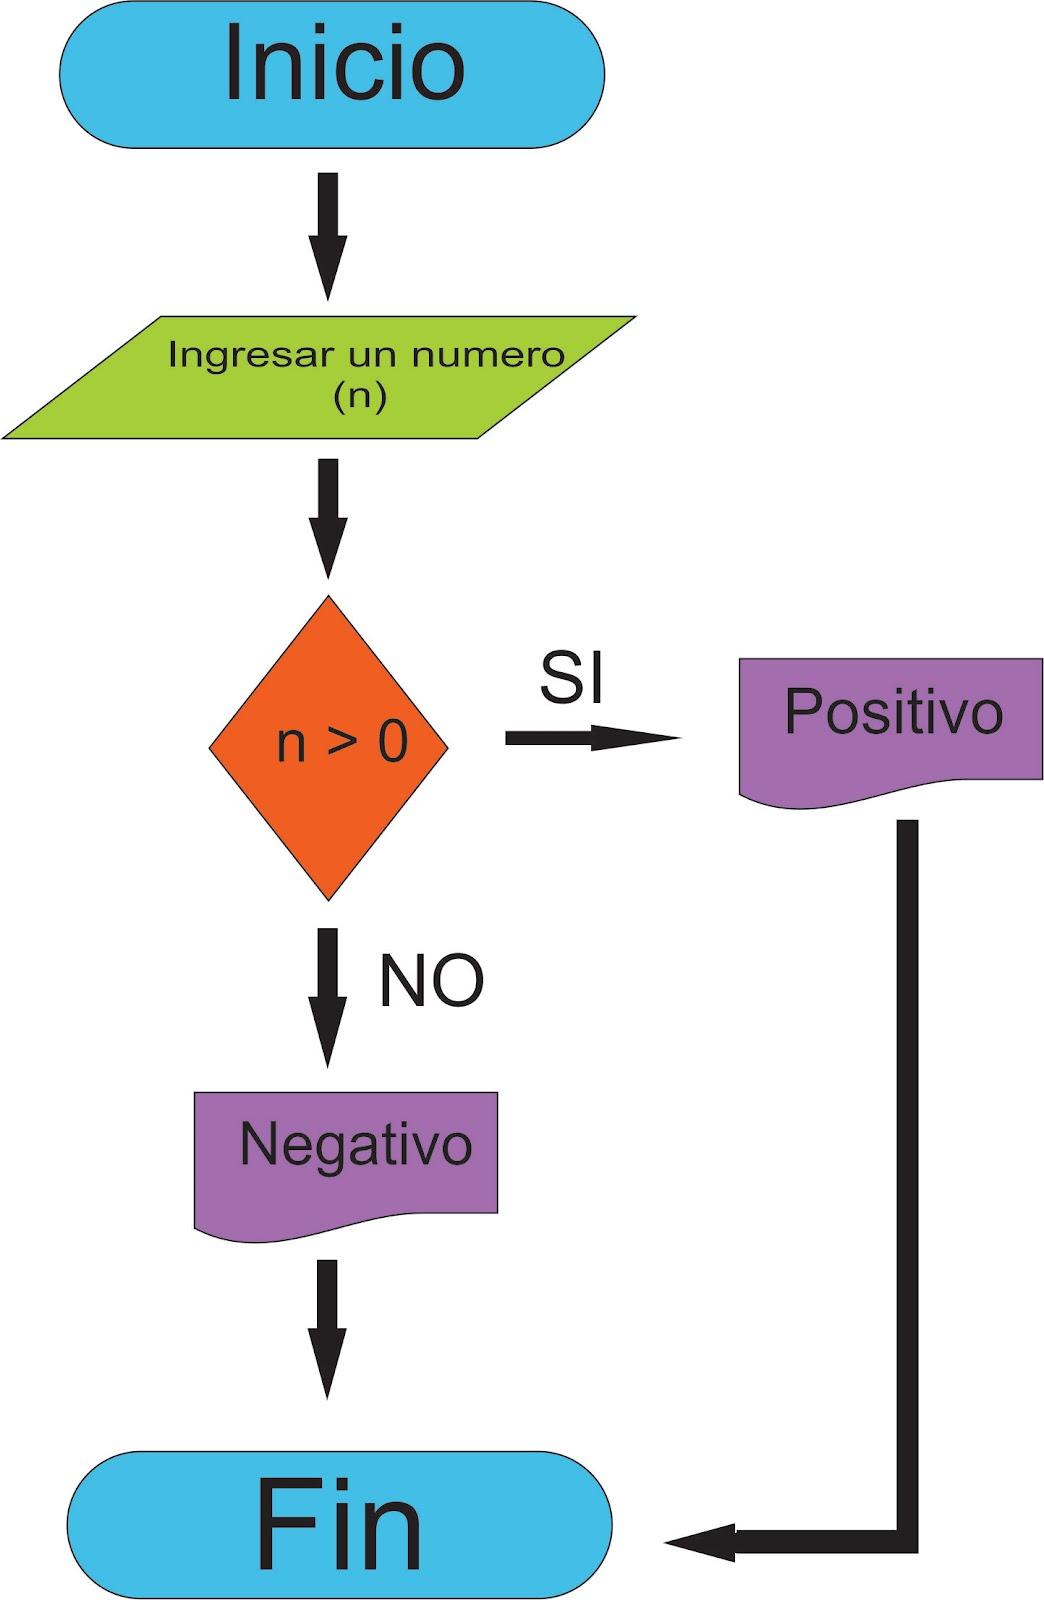 Presentation name on emaze los mtodos ms conocidos son diagramacin libre diagramas de flujo diagramas nassi shneiderman pseudocdigo lenguaje natural espaol ingls ccuart Gallery